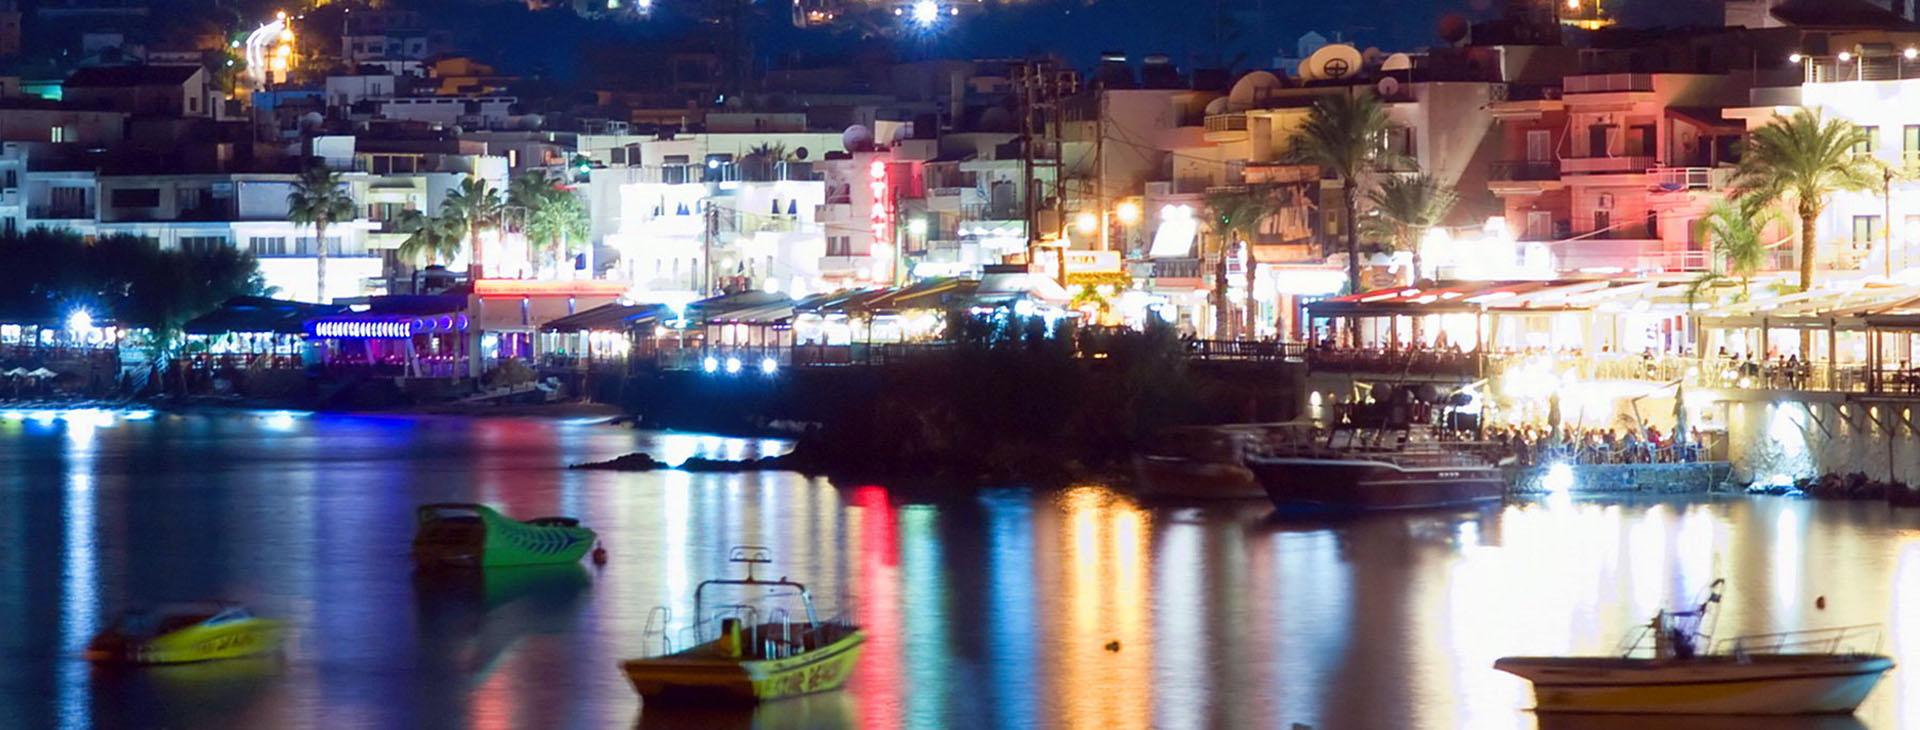 Malia by night, Heraklion